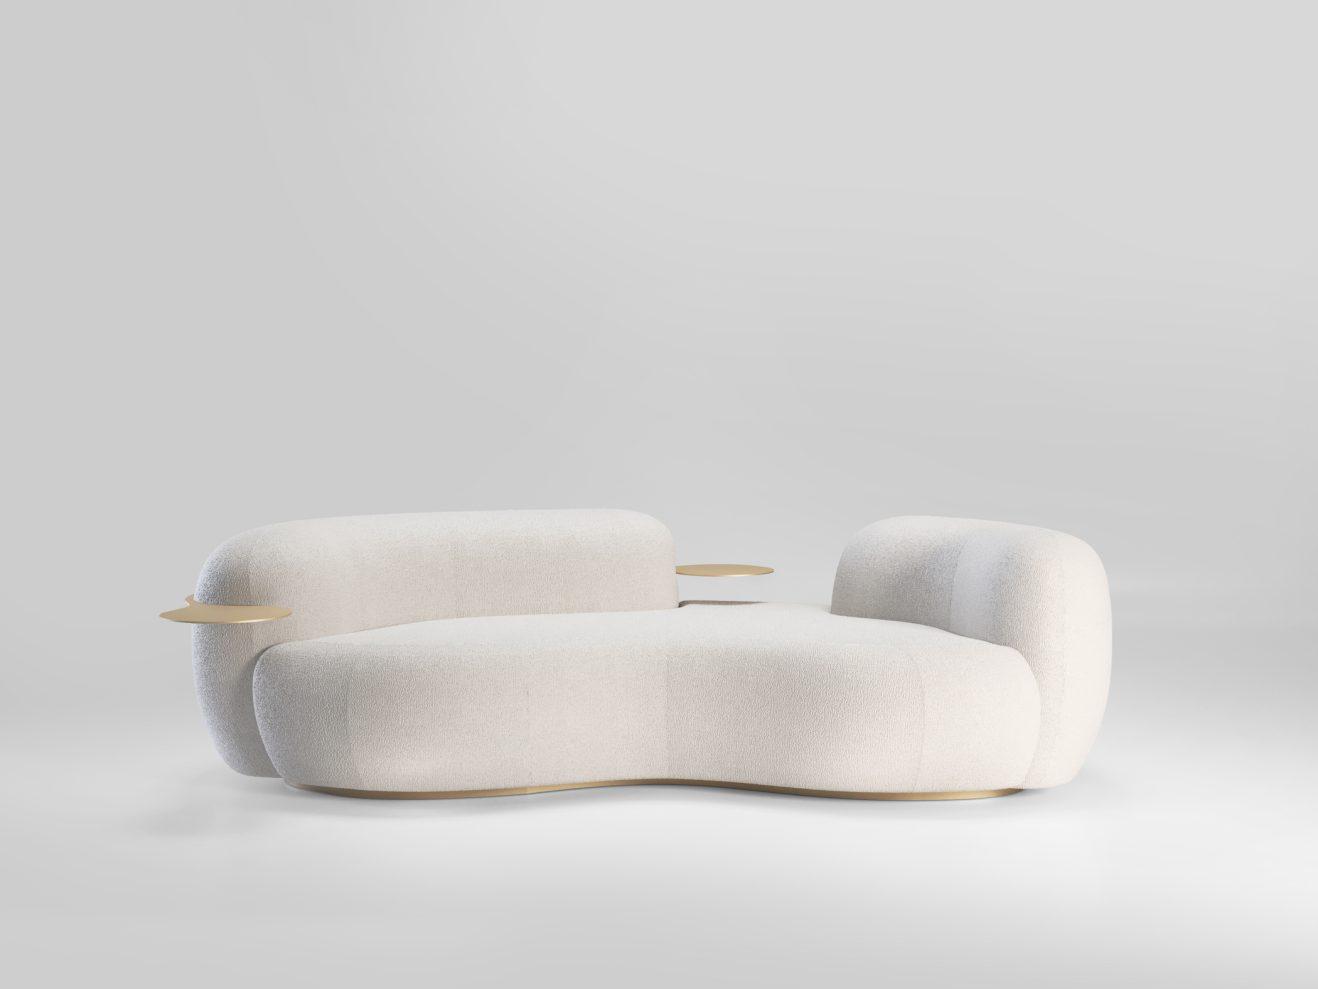 Sofa Tateyama by Artefatto x Secolo 1